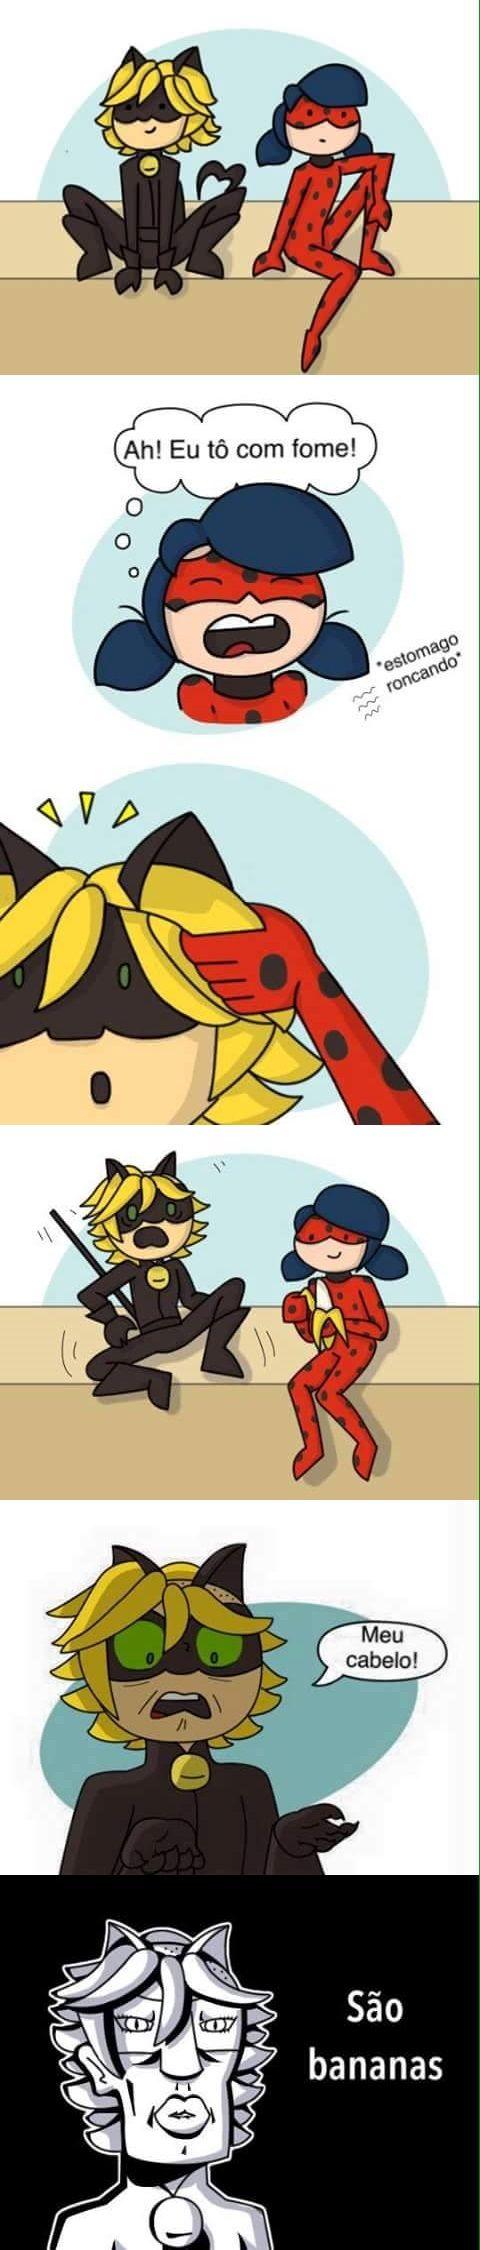 Miraculous Ladybug - Chat Noir e Ladybug  (sempre soube que era banana)